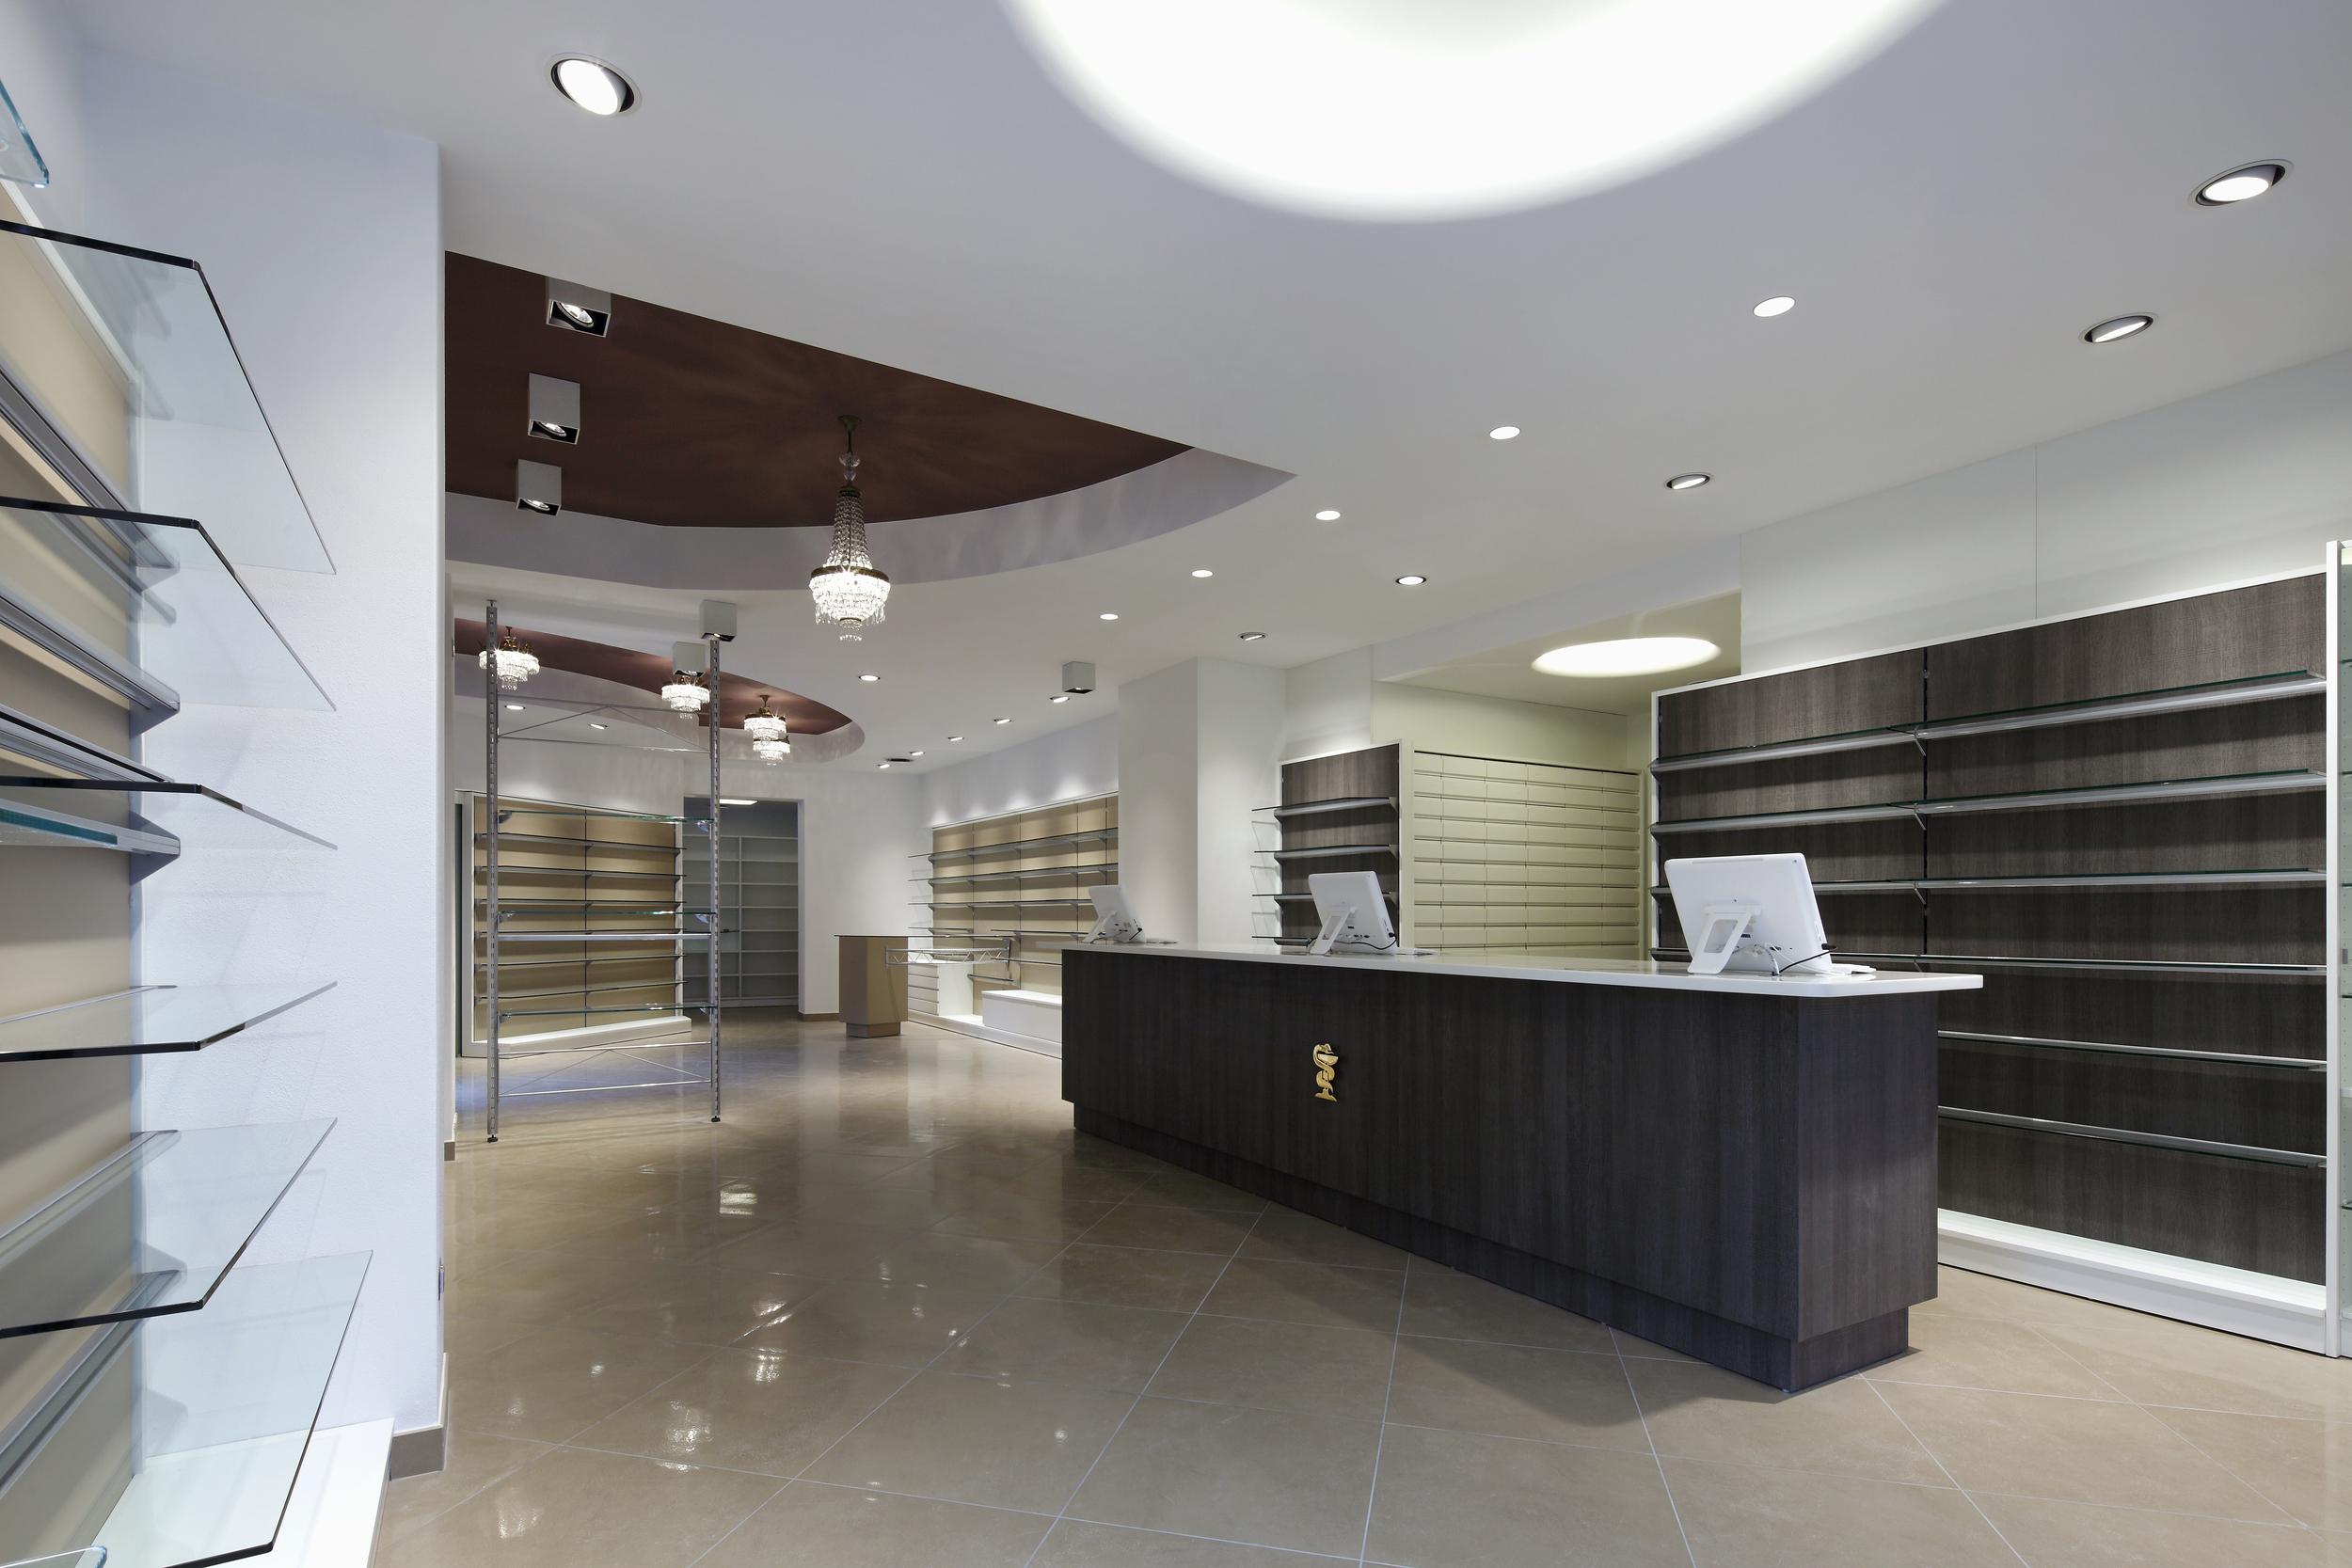 TH.Kohl, Pharmacy Design, Fixtures